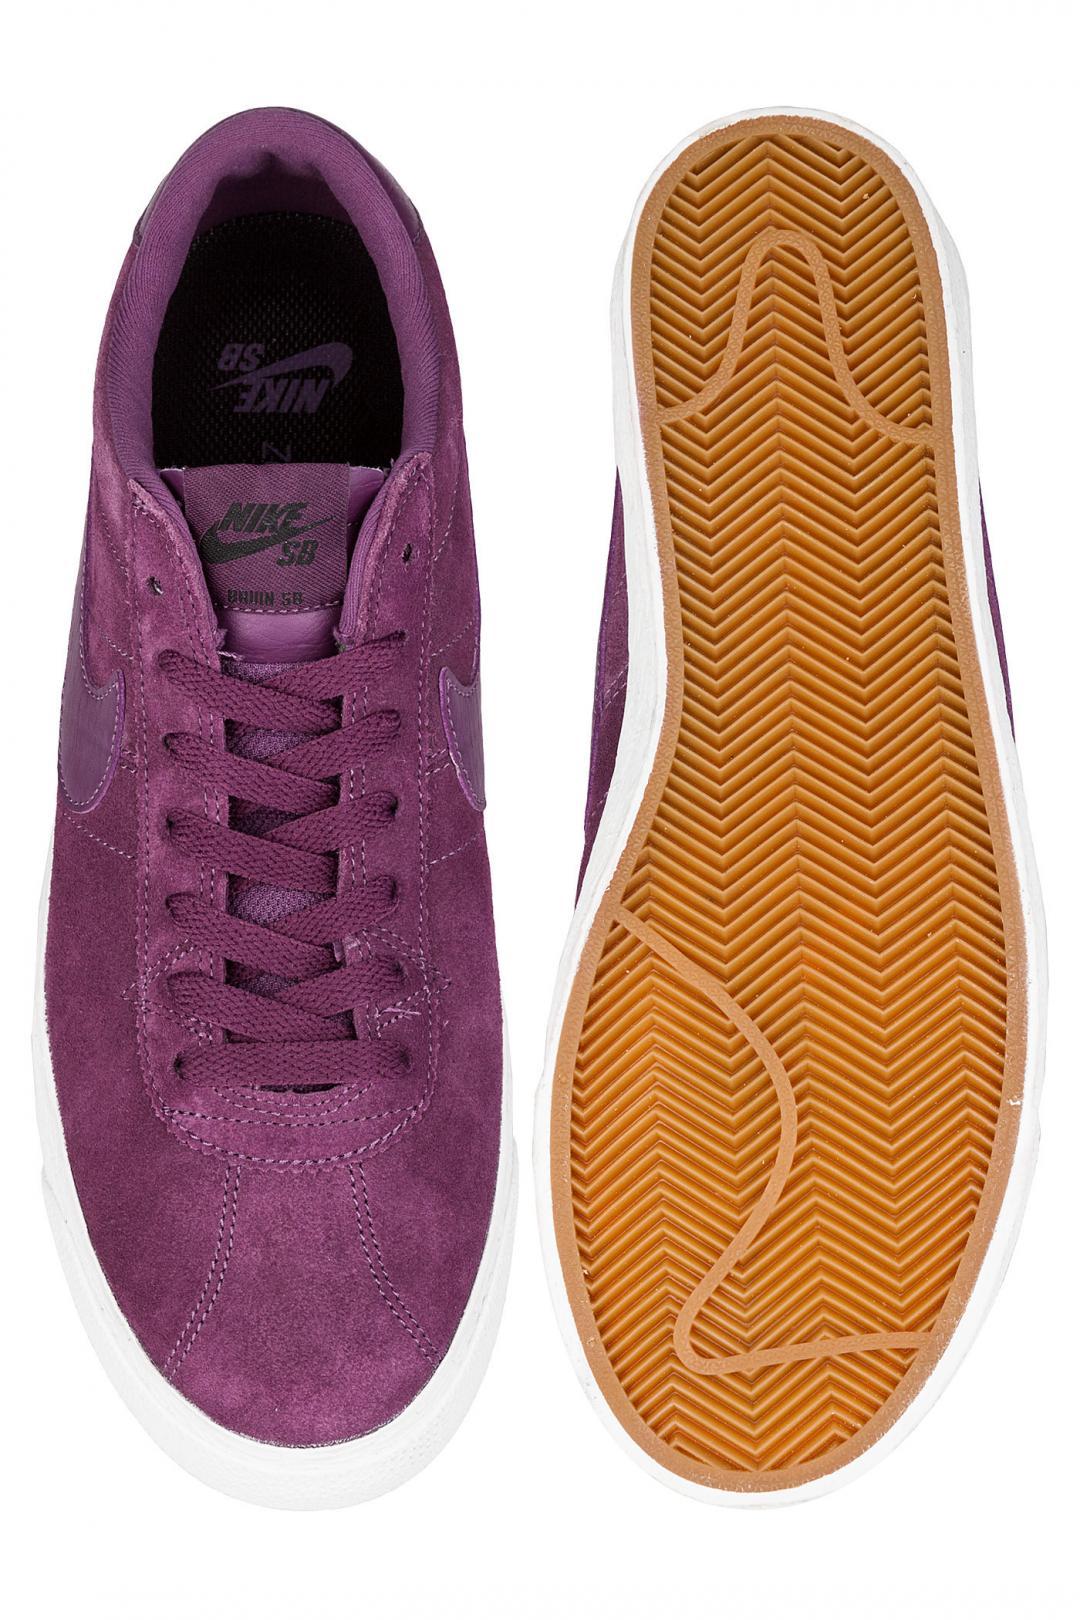 Uomo Nike SB Zoom Bruin pro purple summit white | Sneakers low top